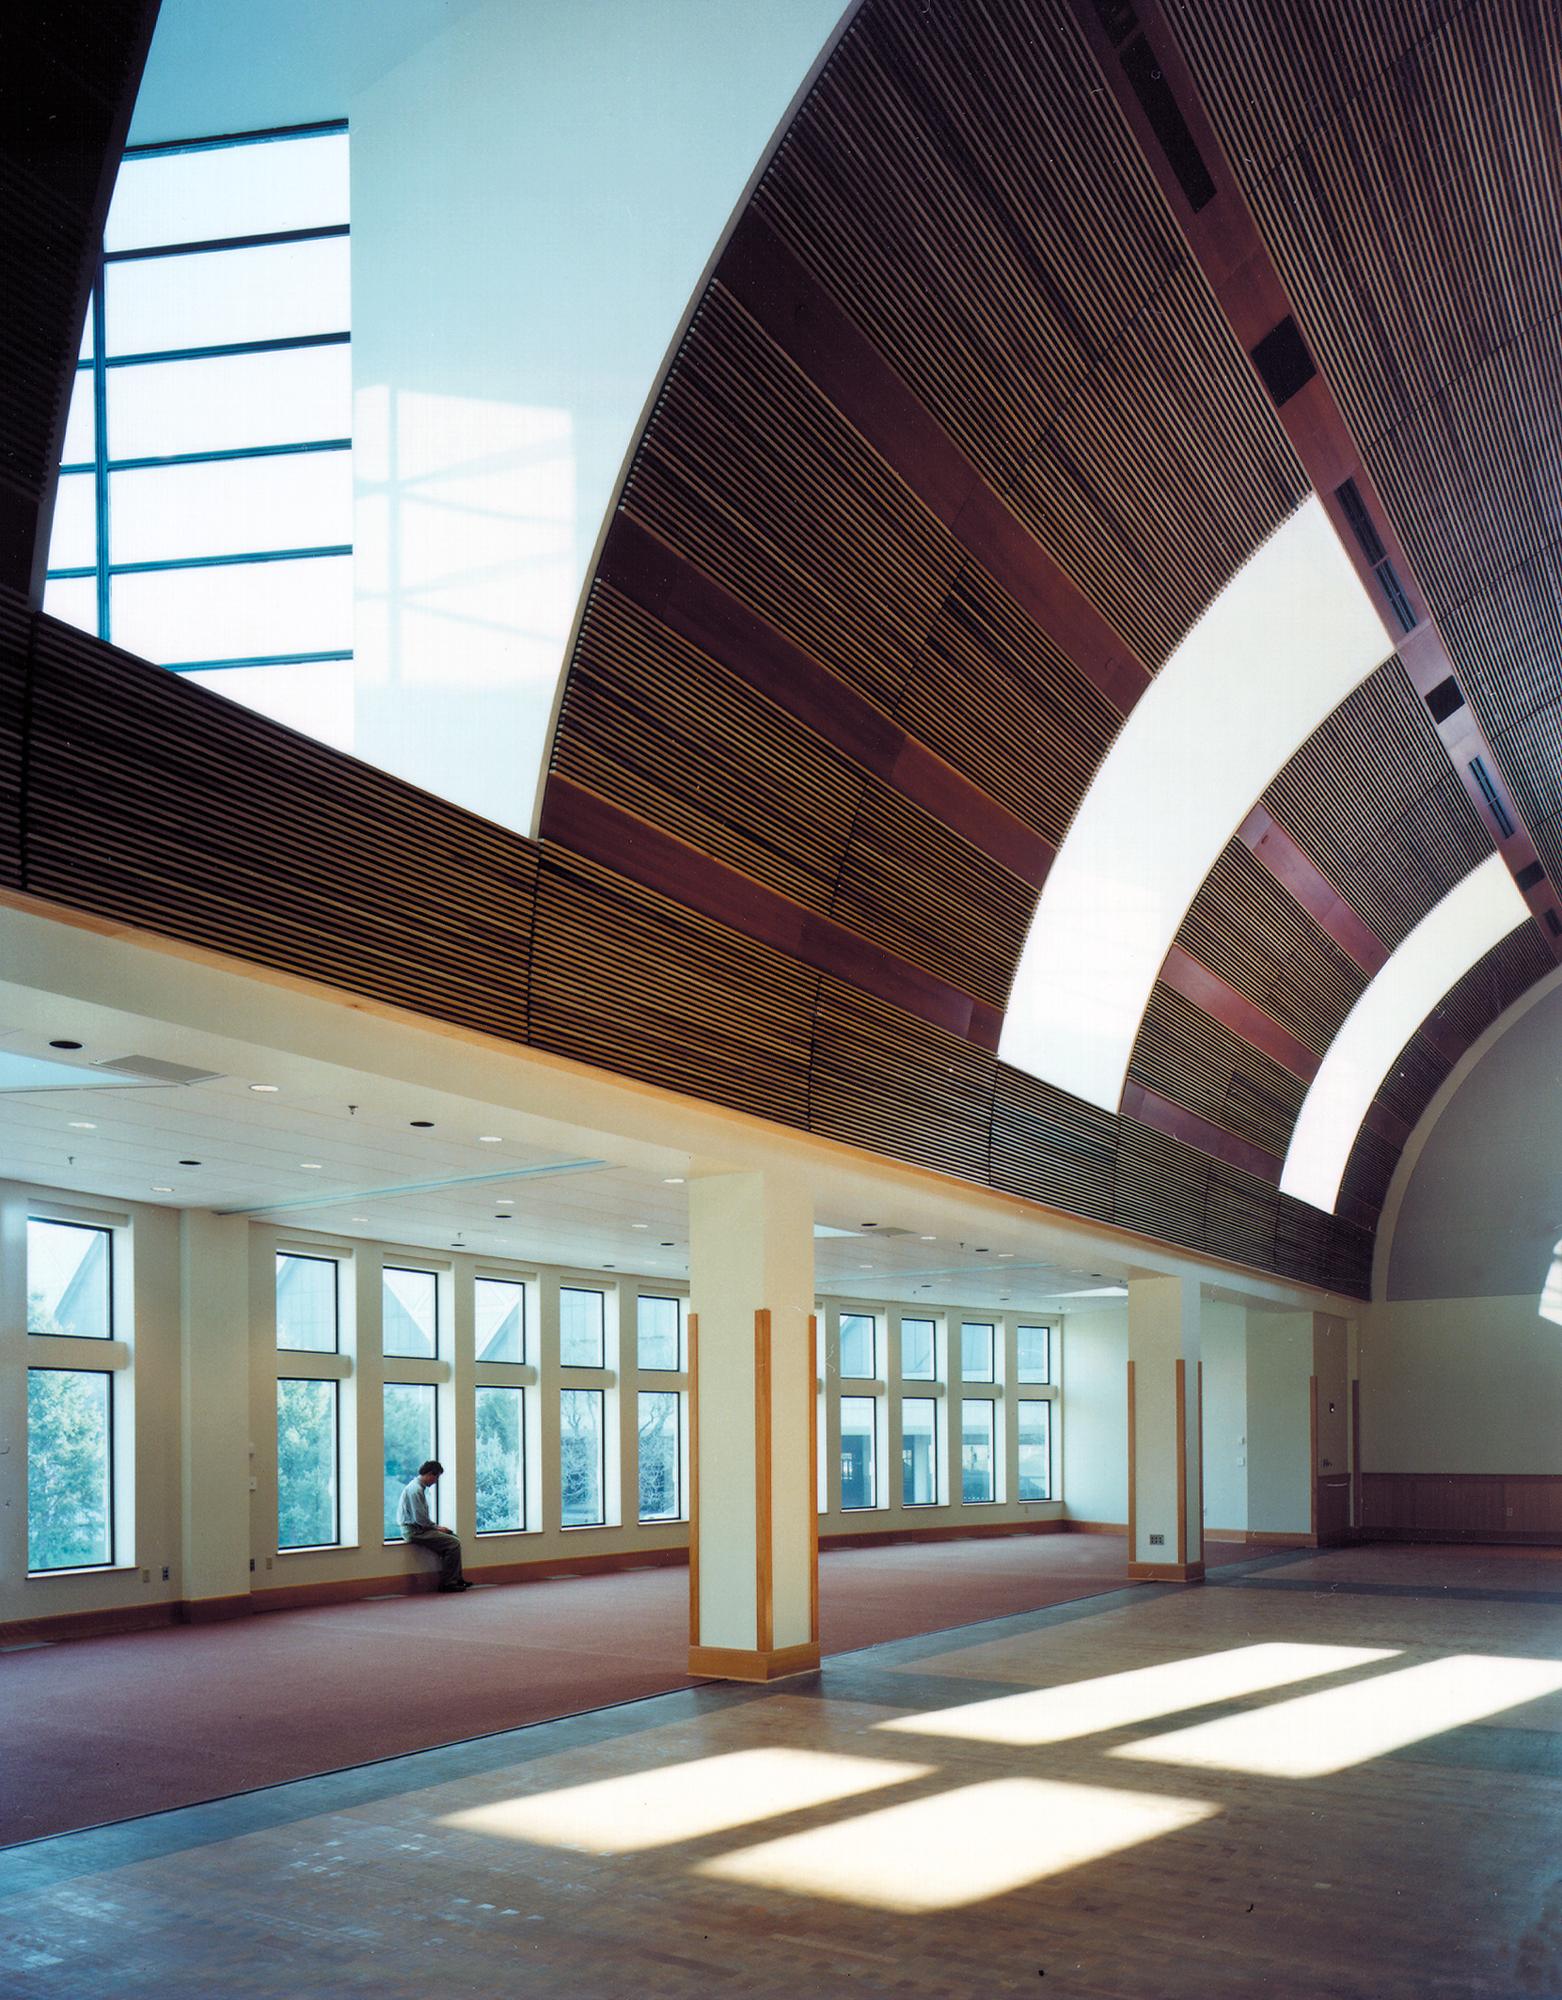 Founder's Hall Interior Showcasing Skylights